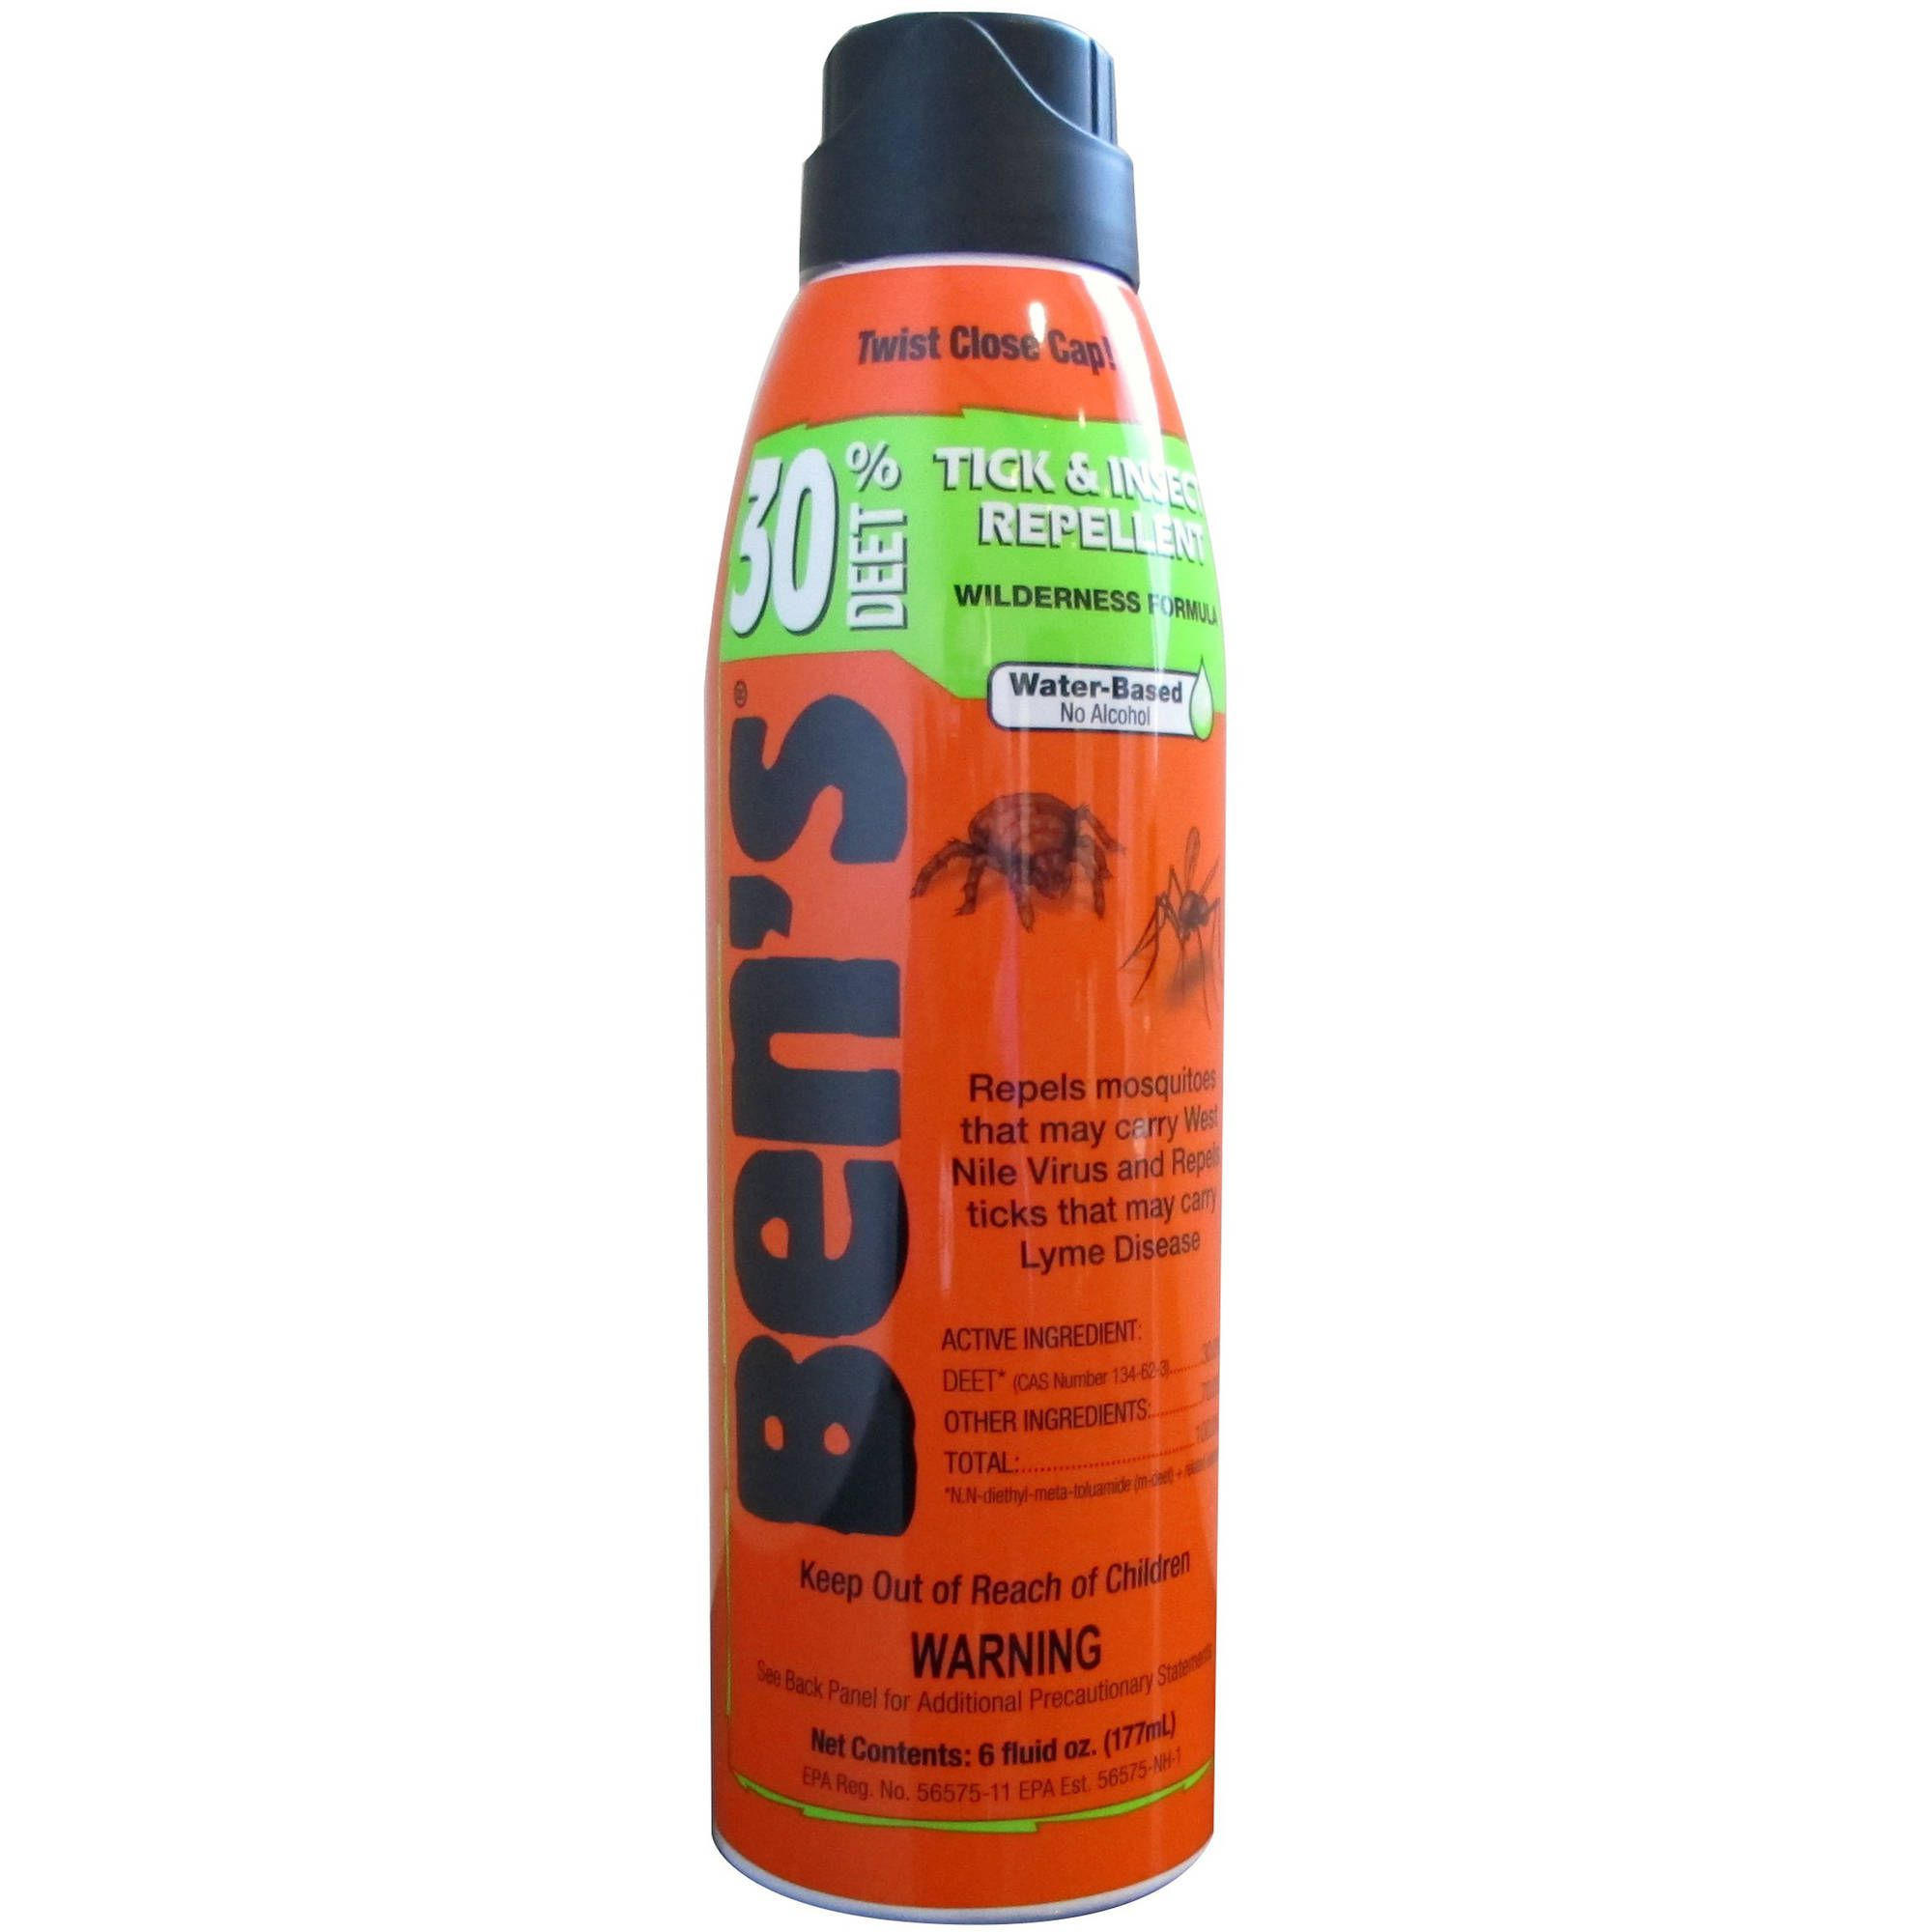 Ben's Eco Spray Insect Repellent